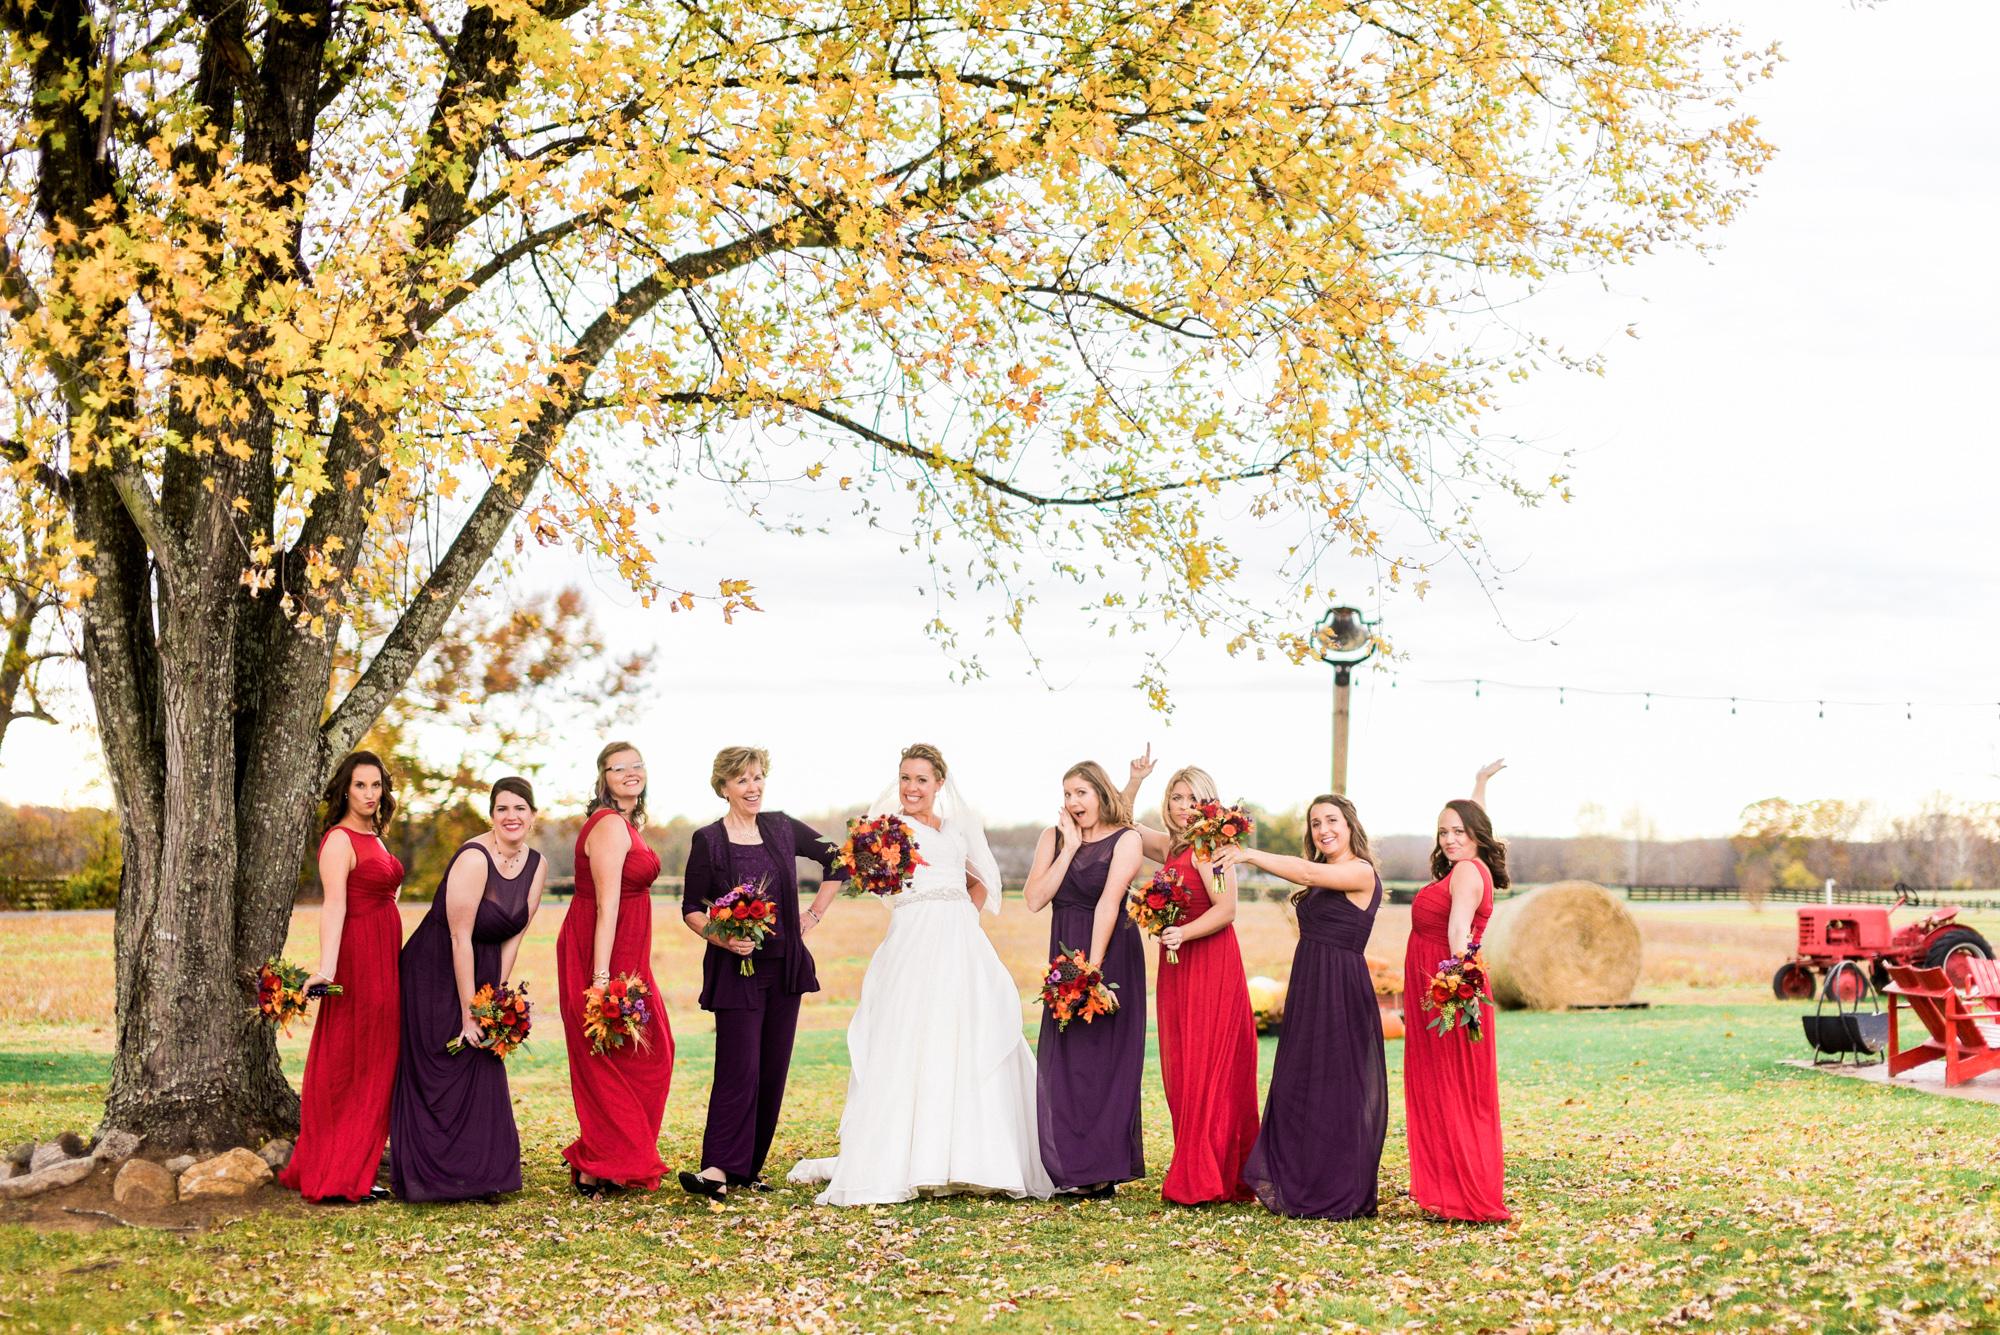 88lovestories-wedding_0022.jpg